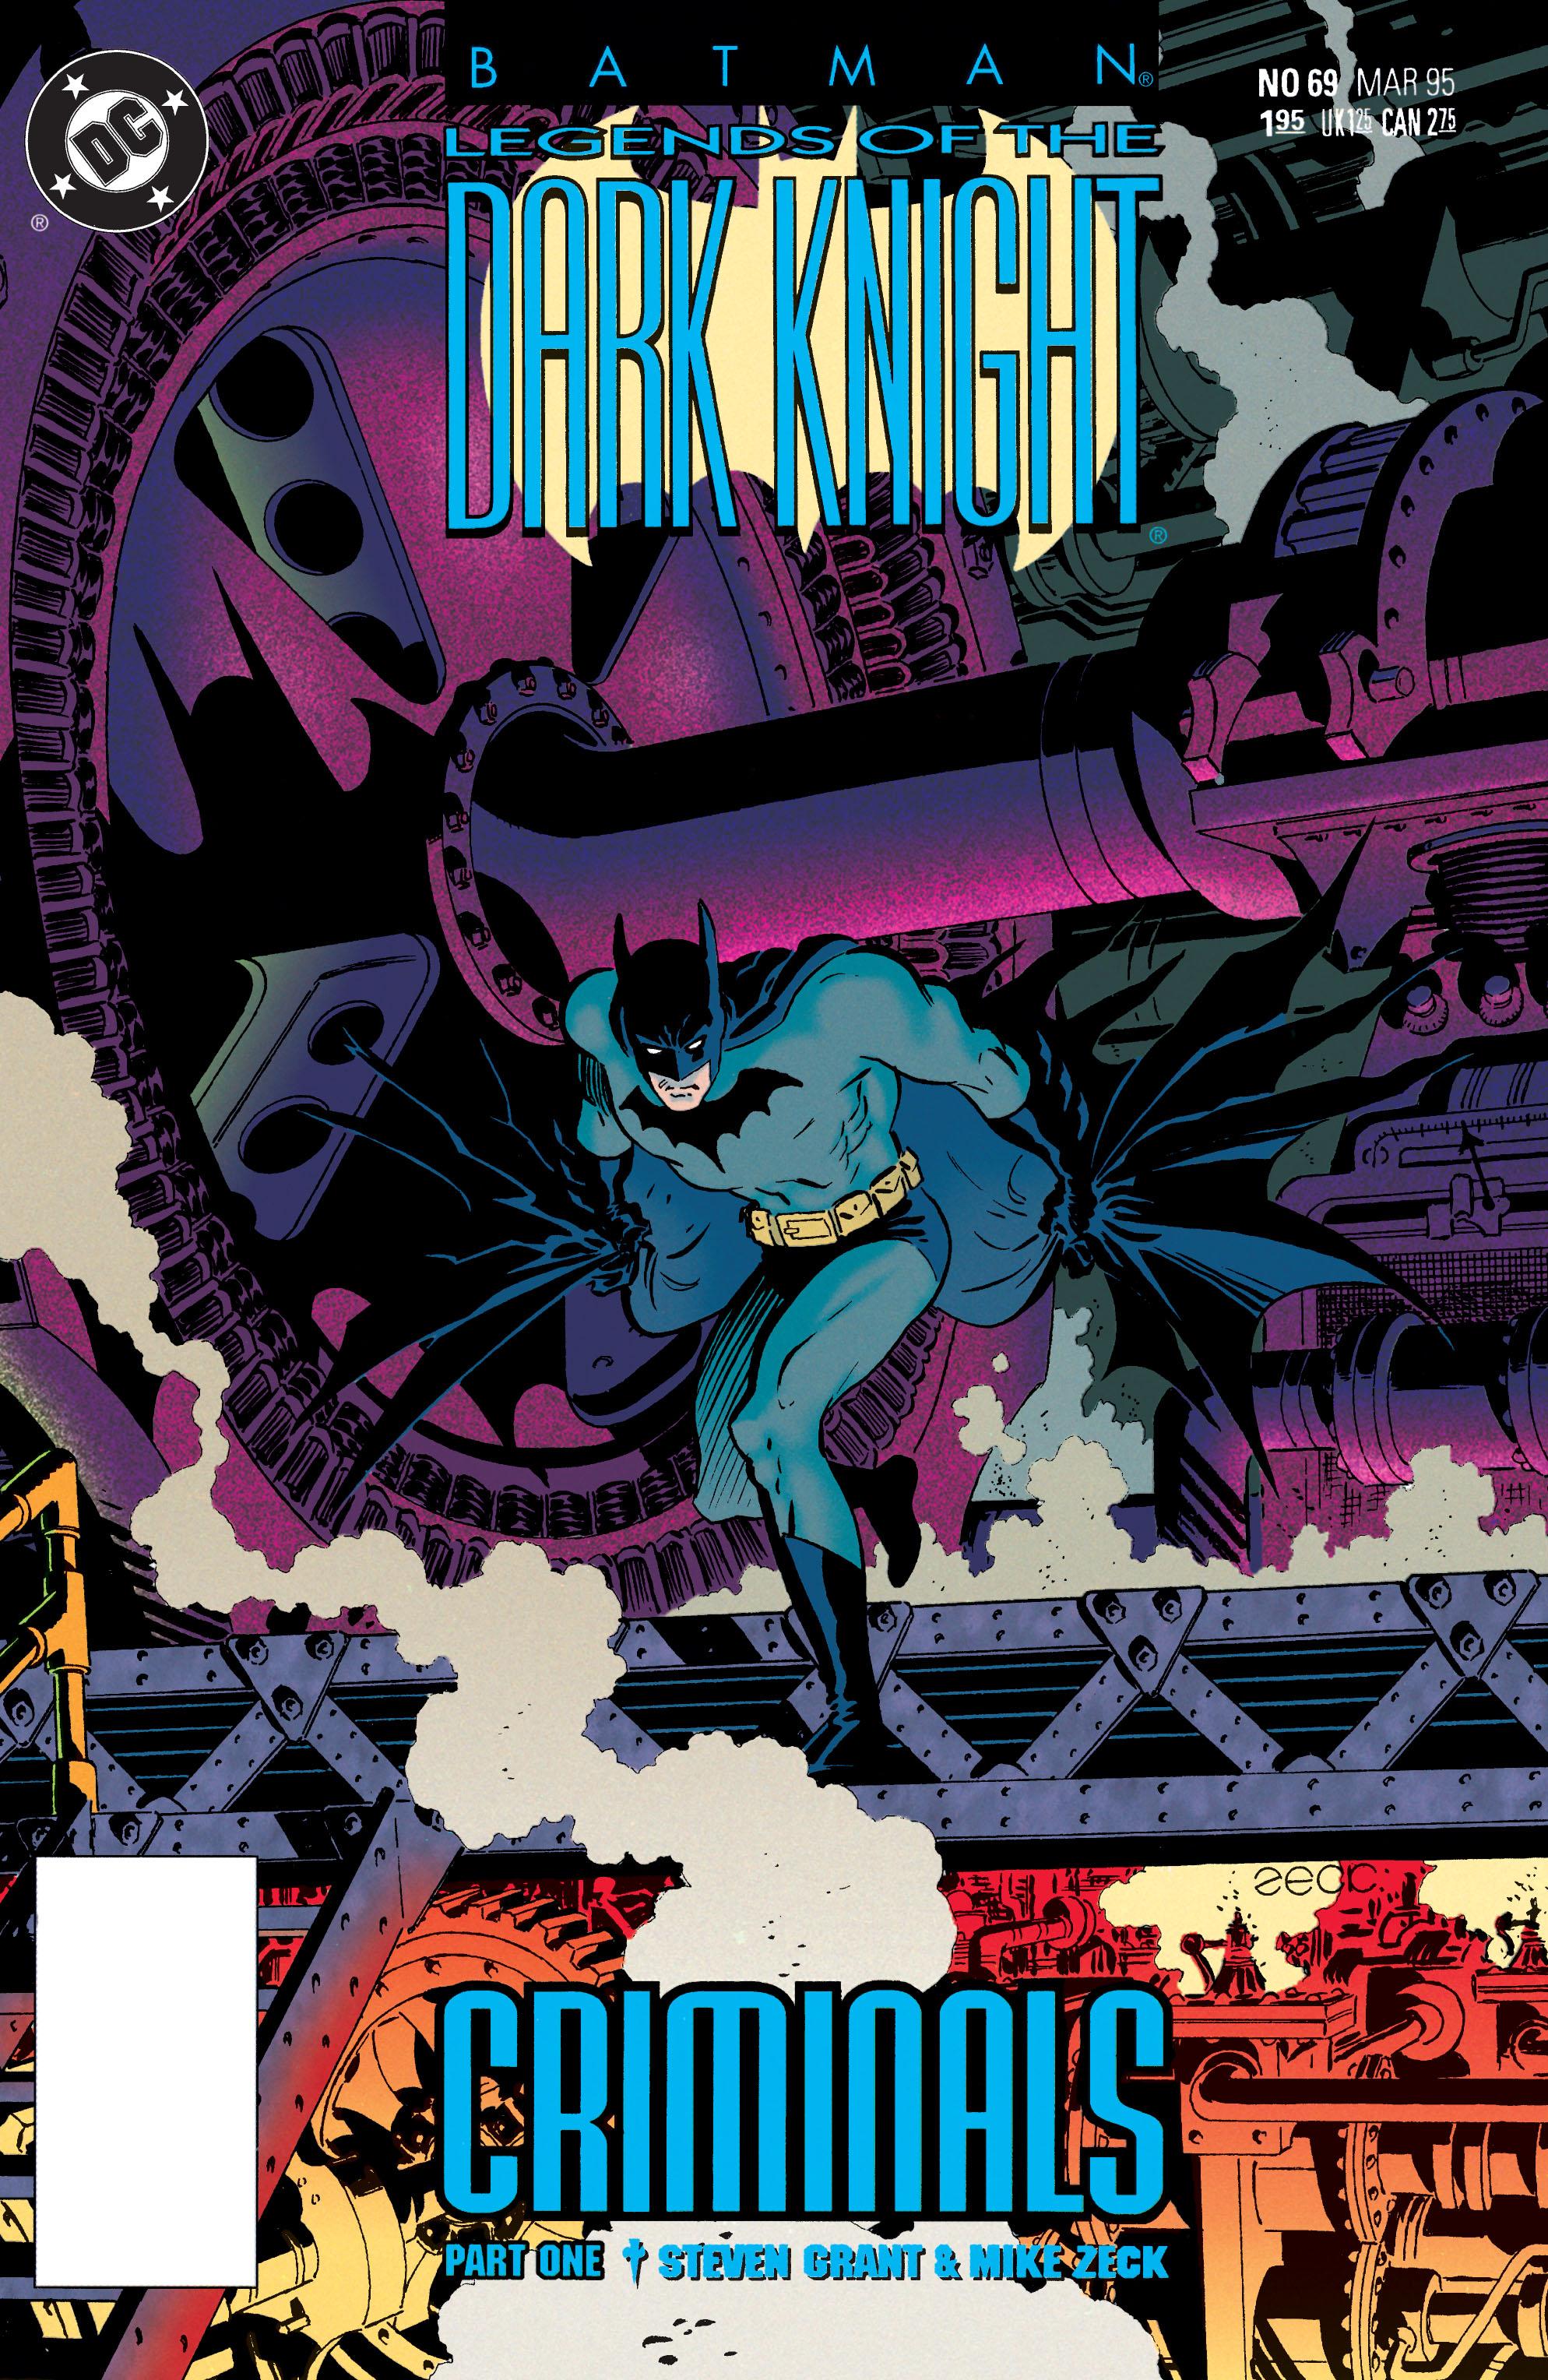 Batman: Legends of the Dark Knight 69 Page 1